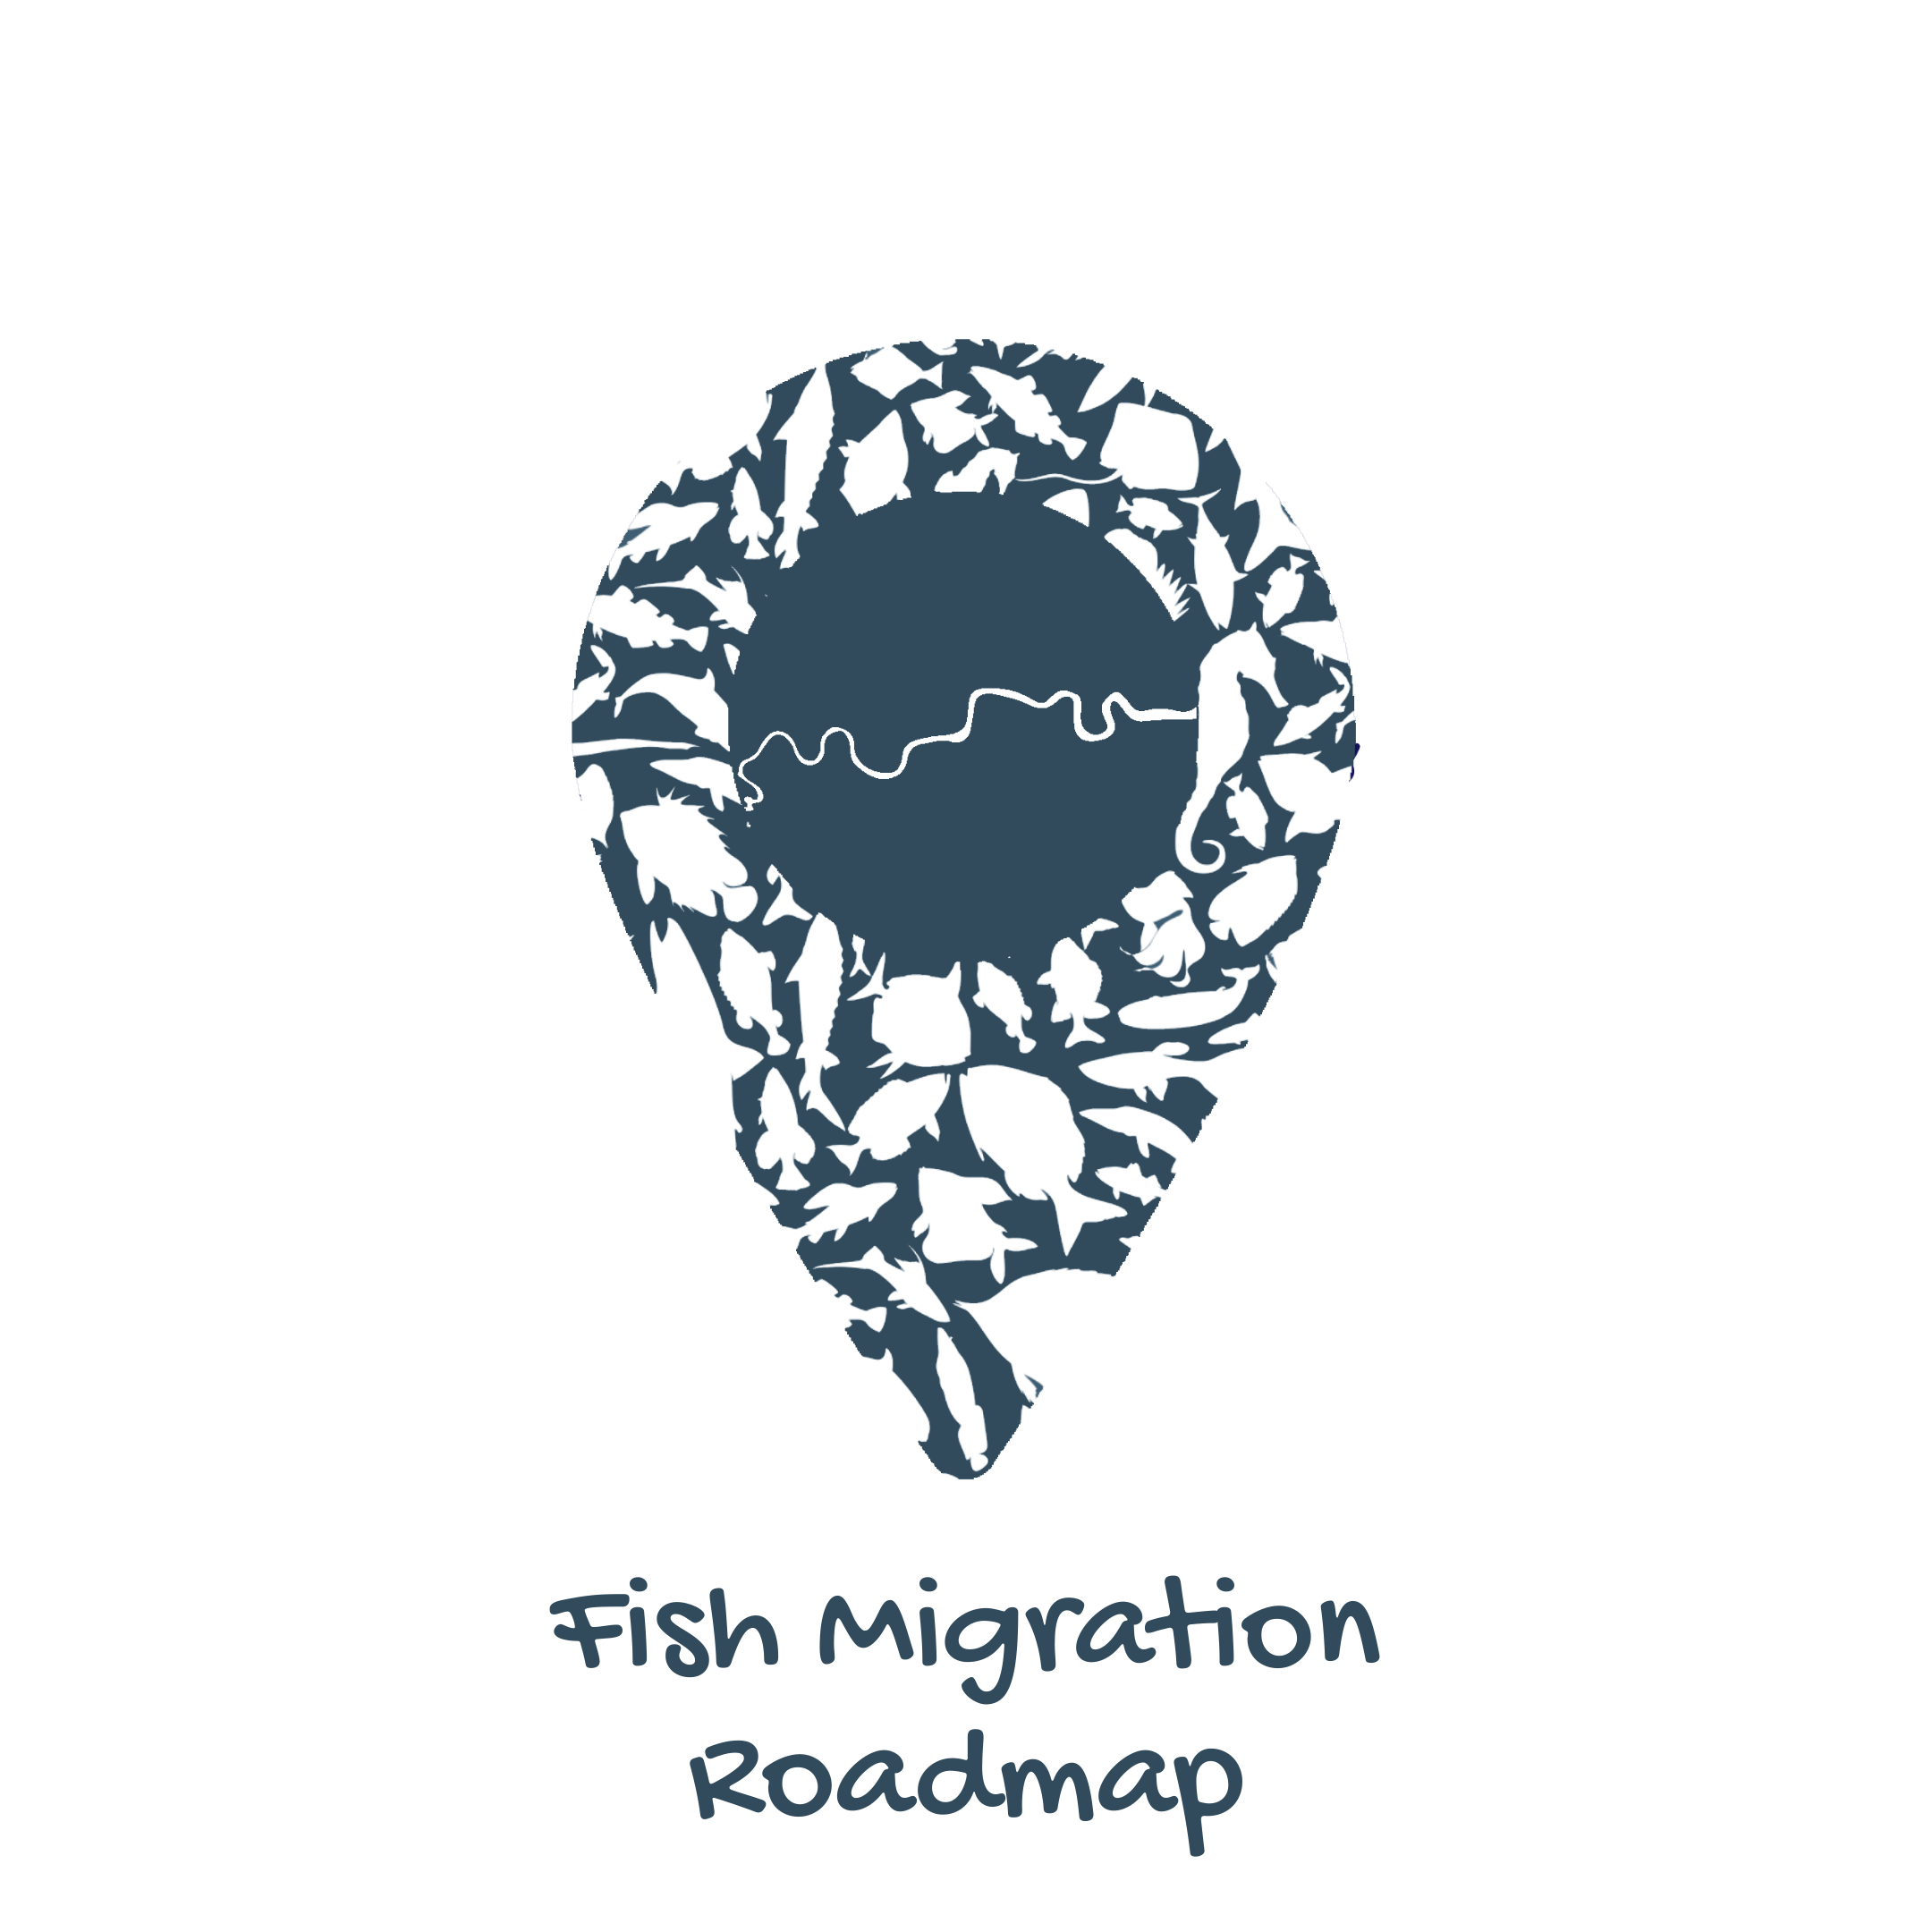 Roadmap_logo_TEP